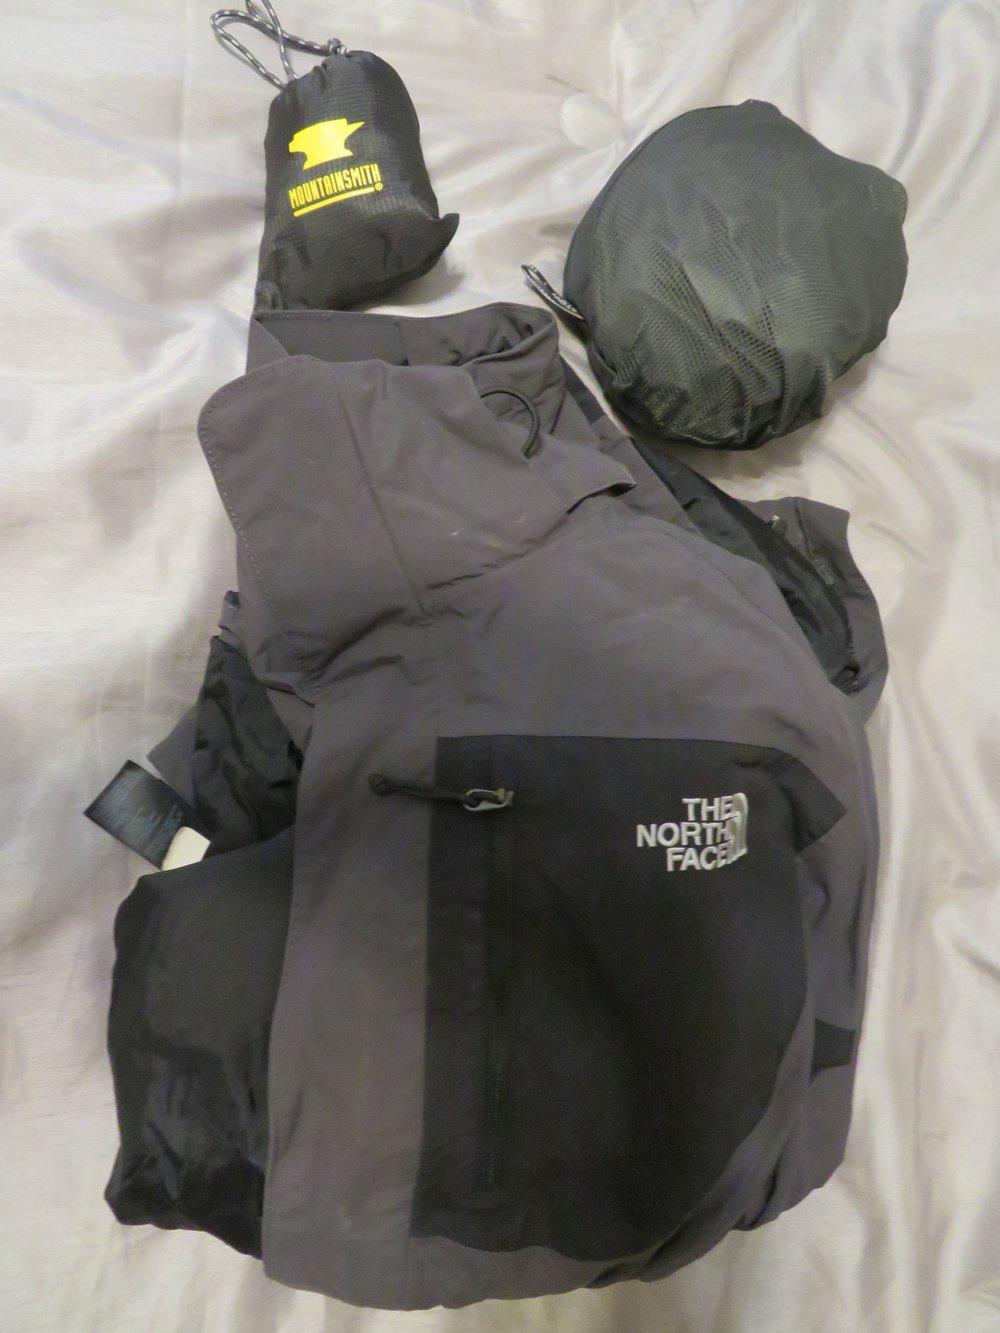 David's rain gear - pack cover, rain pants and rain jacket